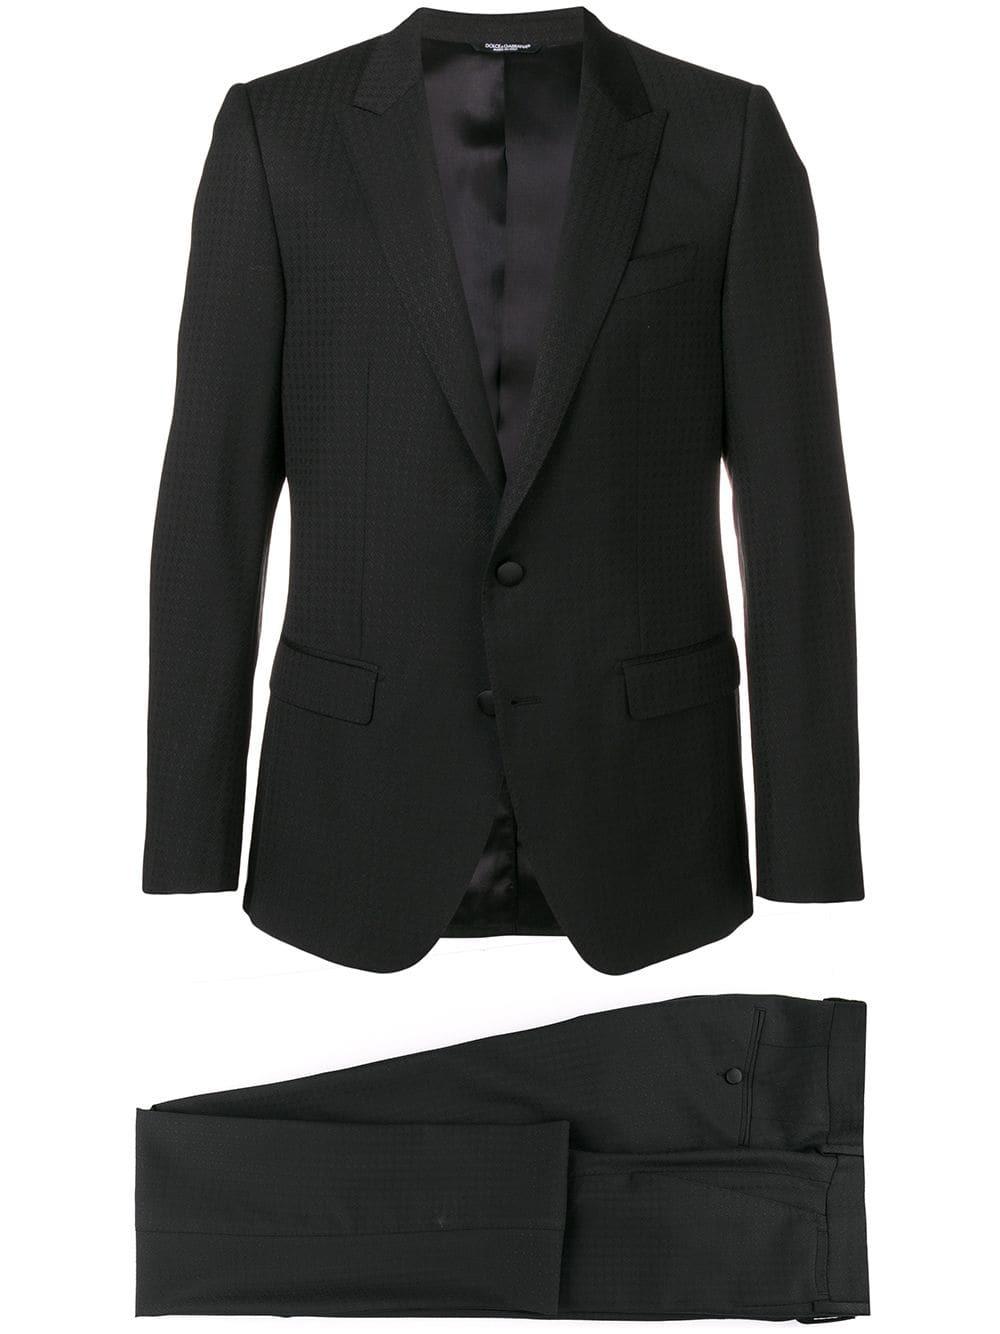 Traje a cuadros negro de Dolce & Gabbana